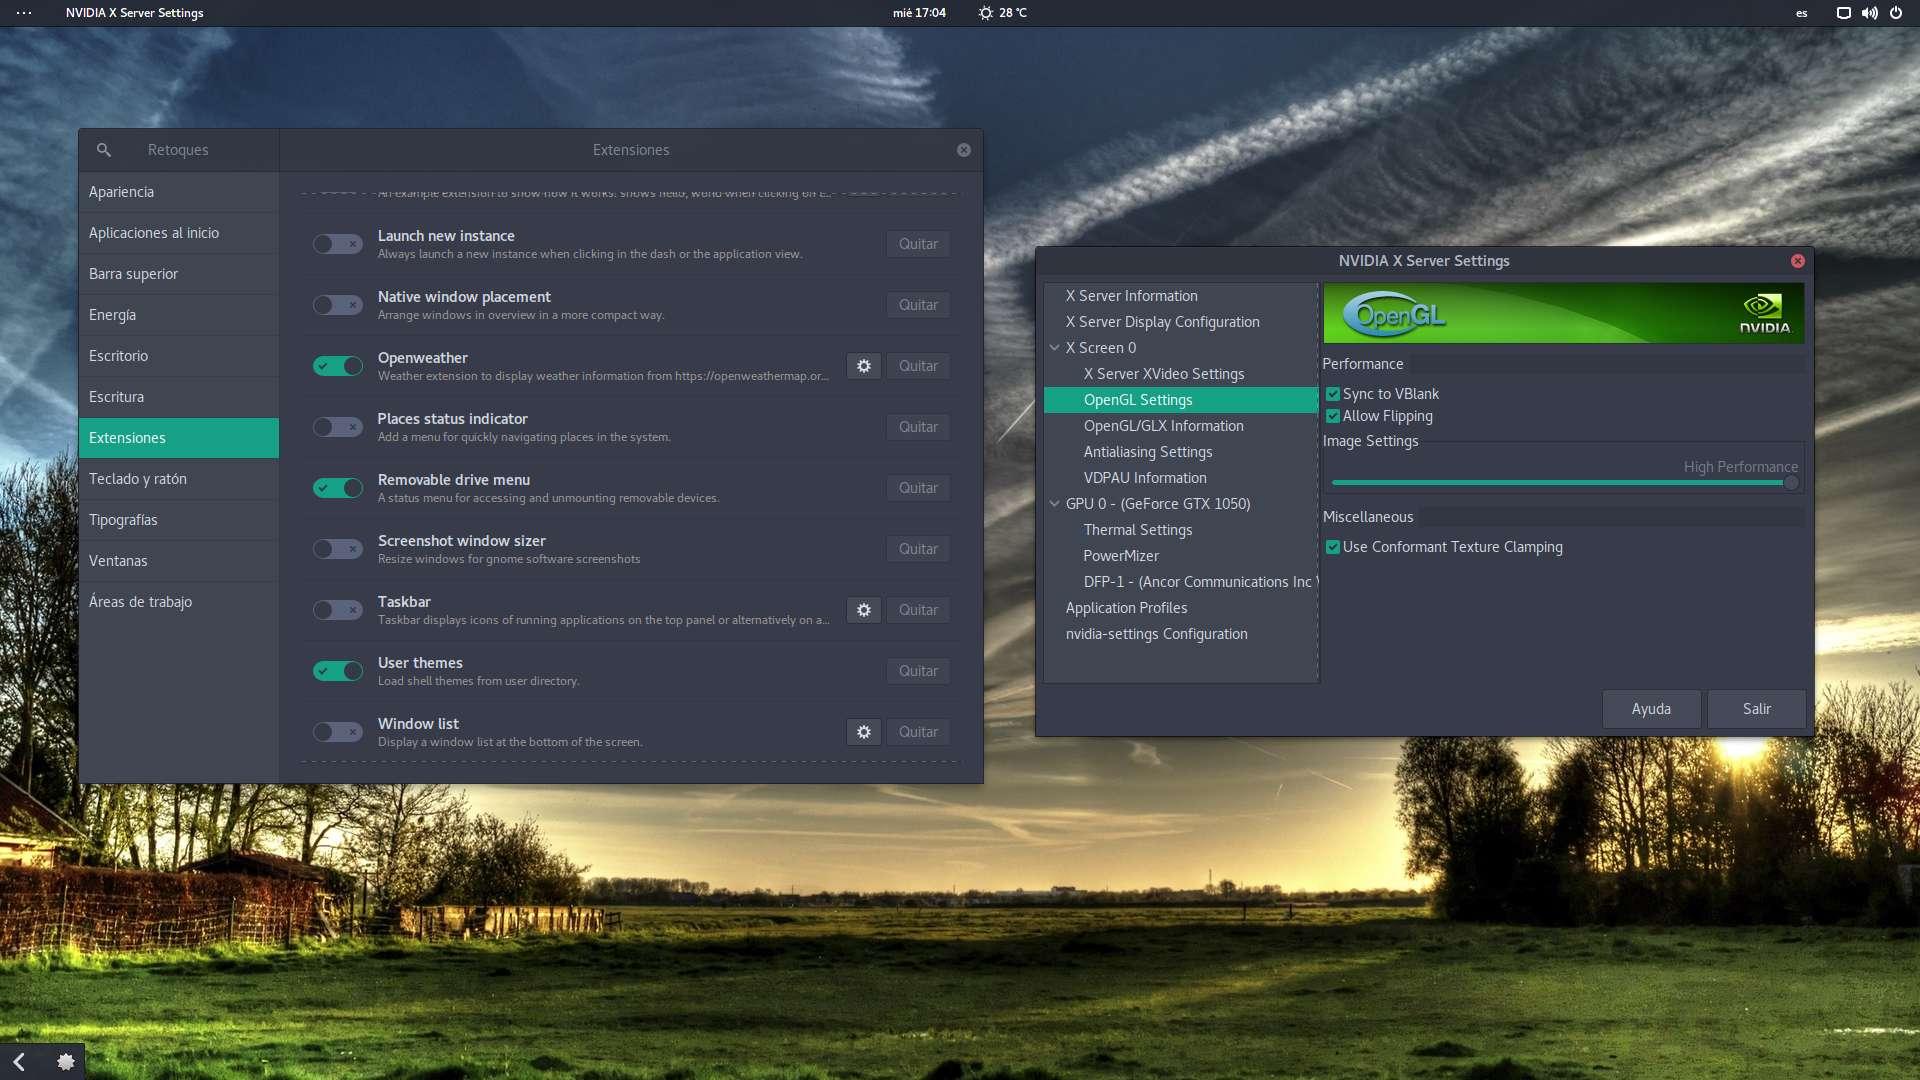 Extensiones usadas por Eduardo Medina en Manjaro GNOME